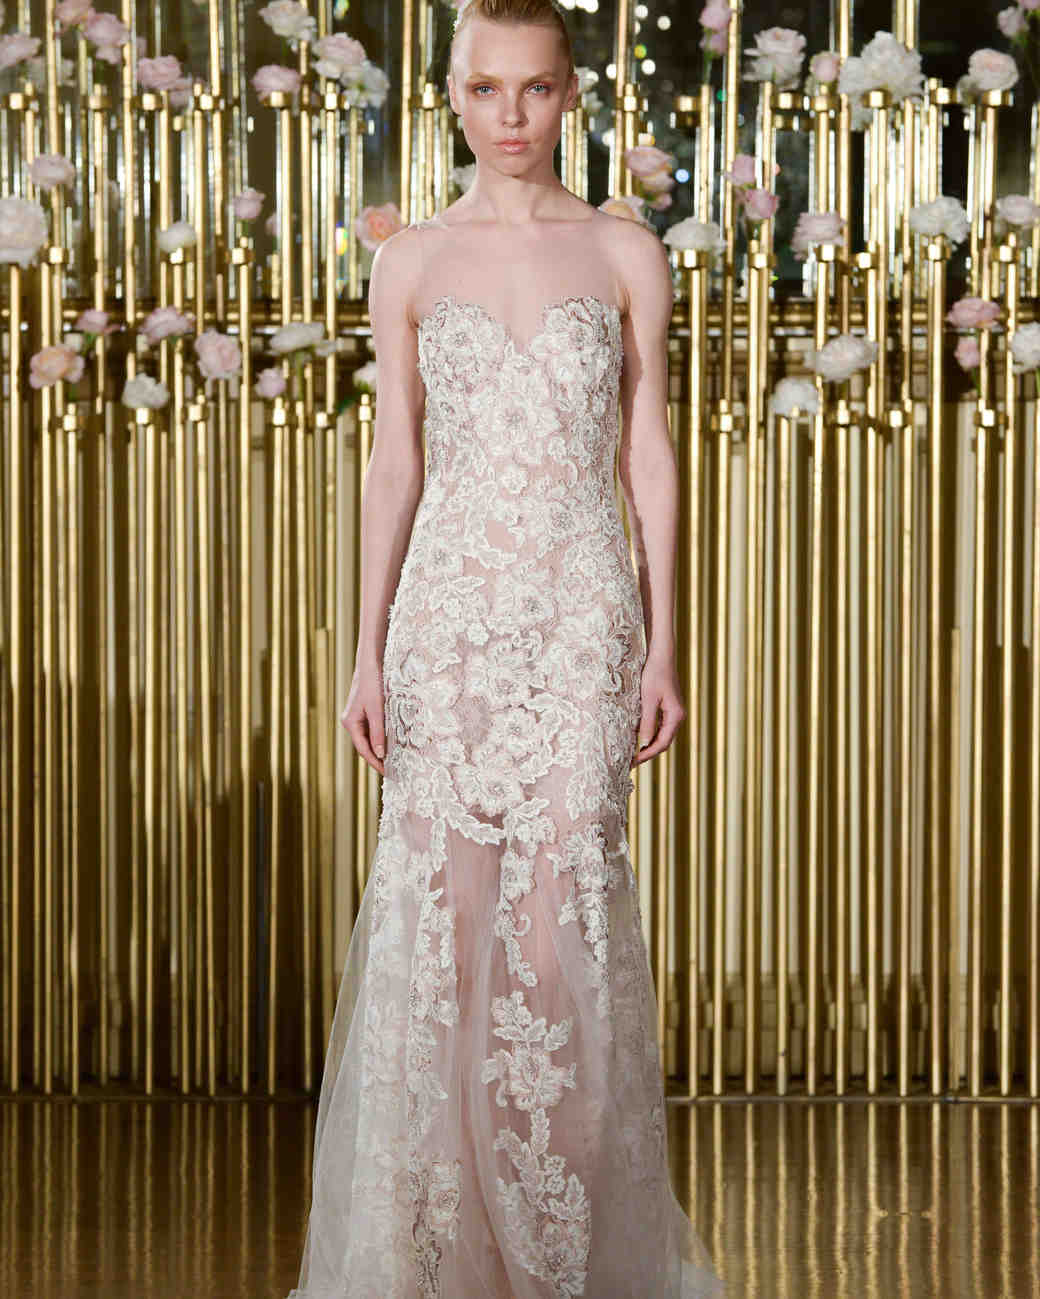 Francesca Miranda Strapless Wedding Dress with Lace Spring 2018